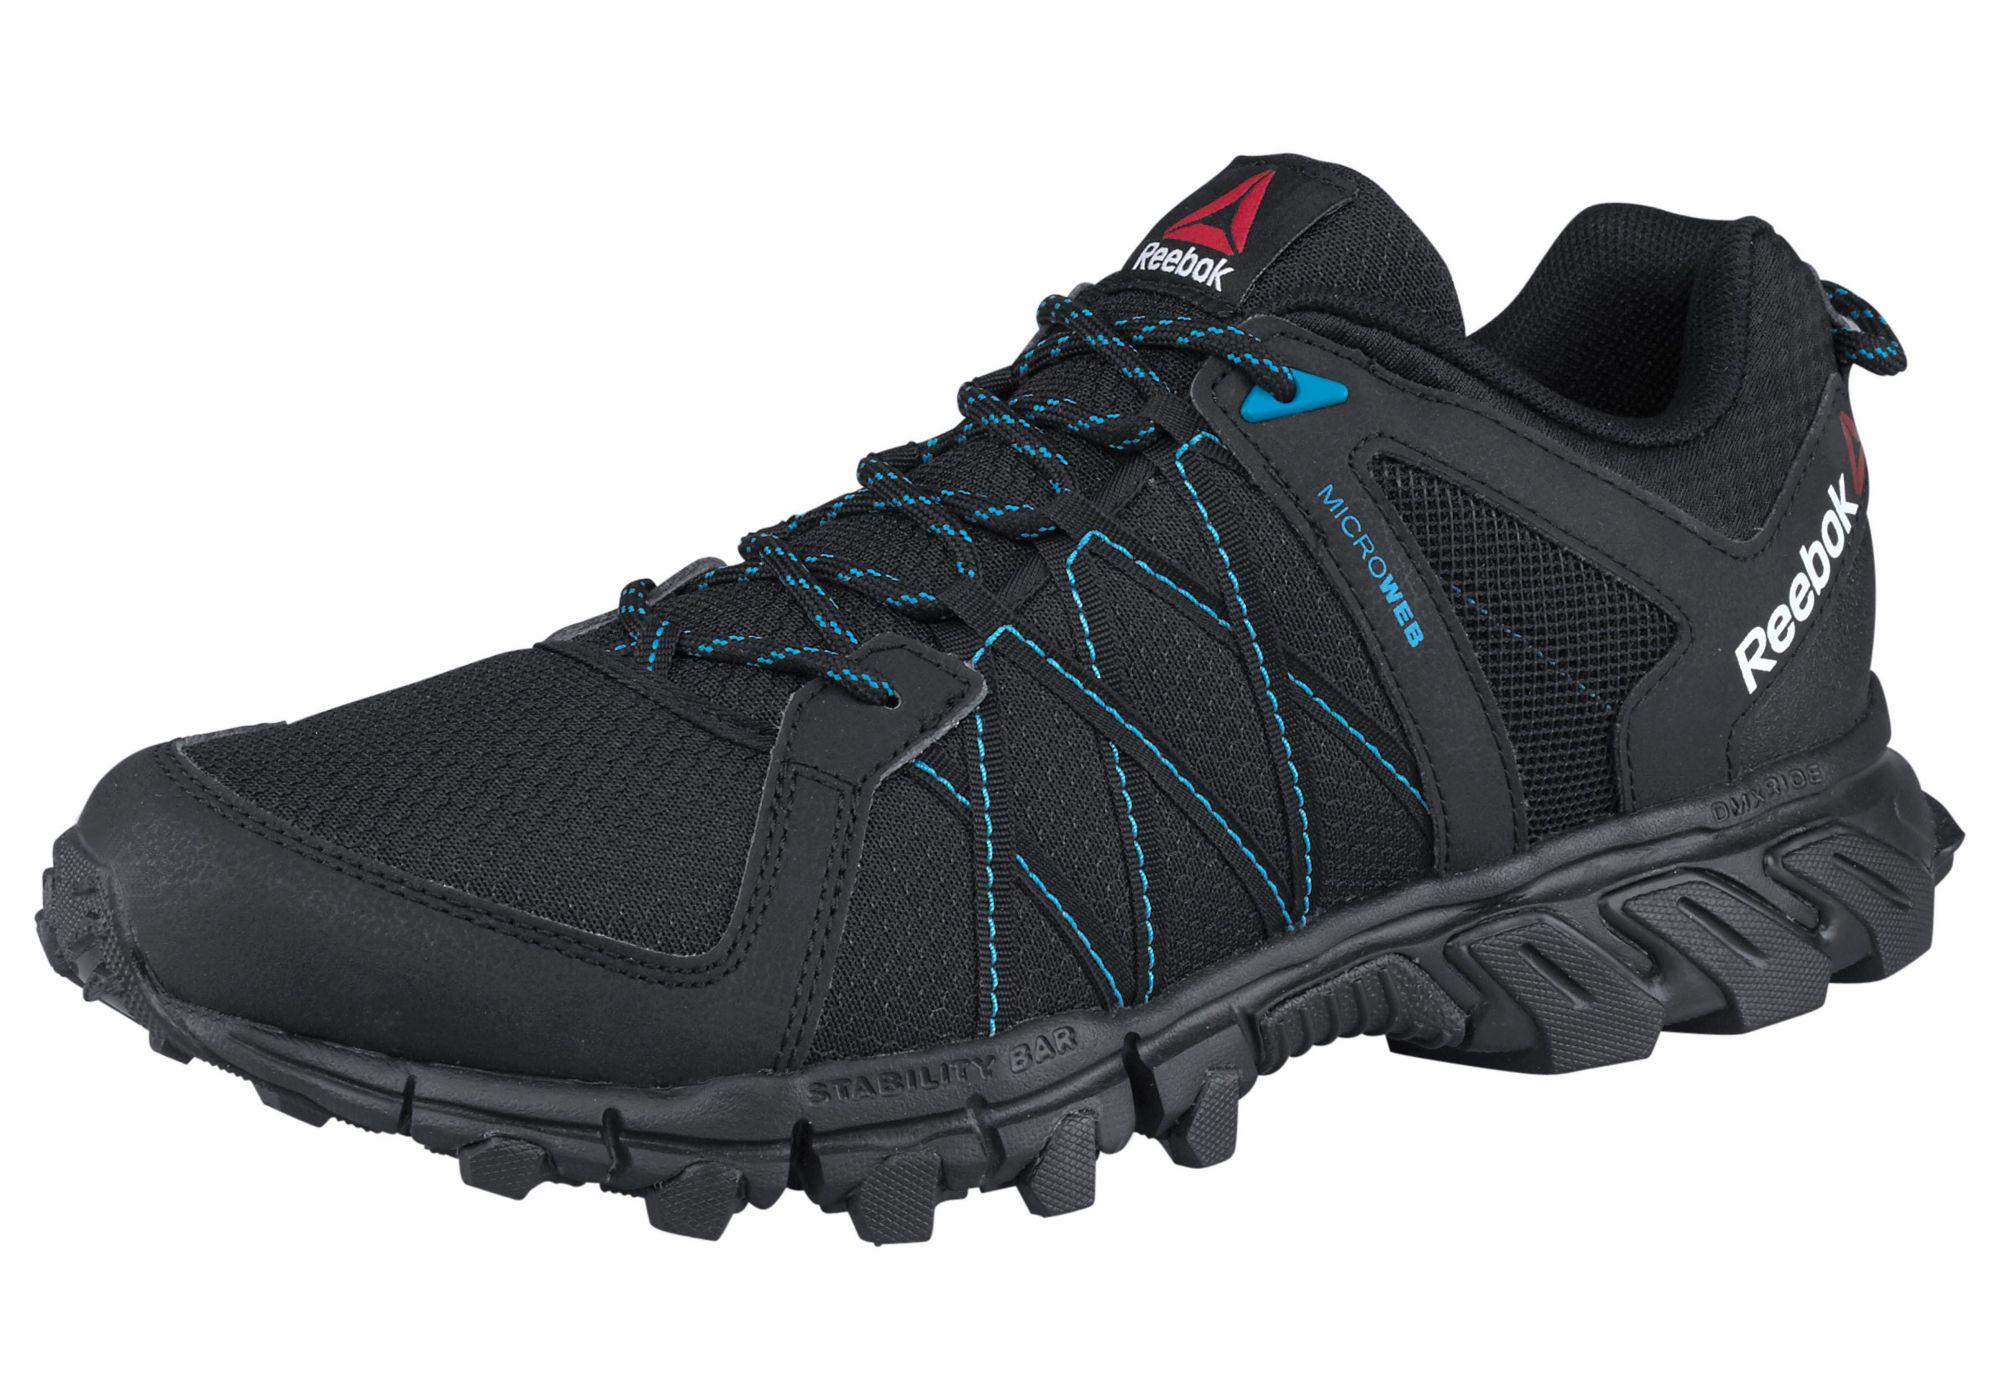 REEBOK Reebok Walkingschuh »Trail Grip RS 5.0 M«